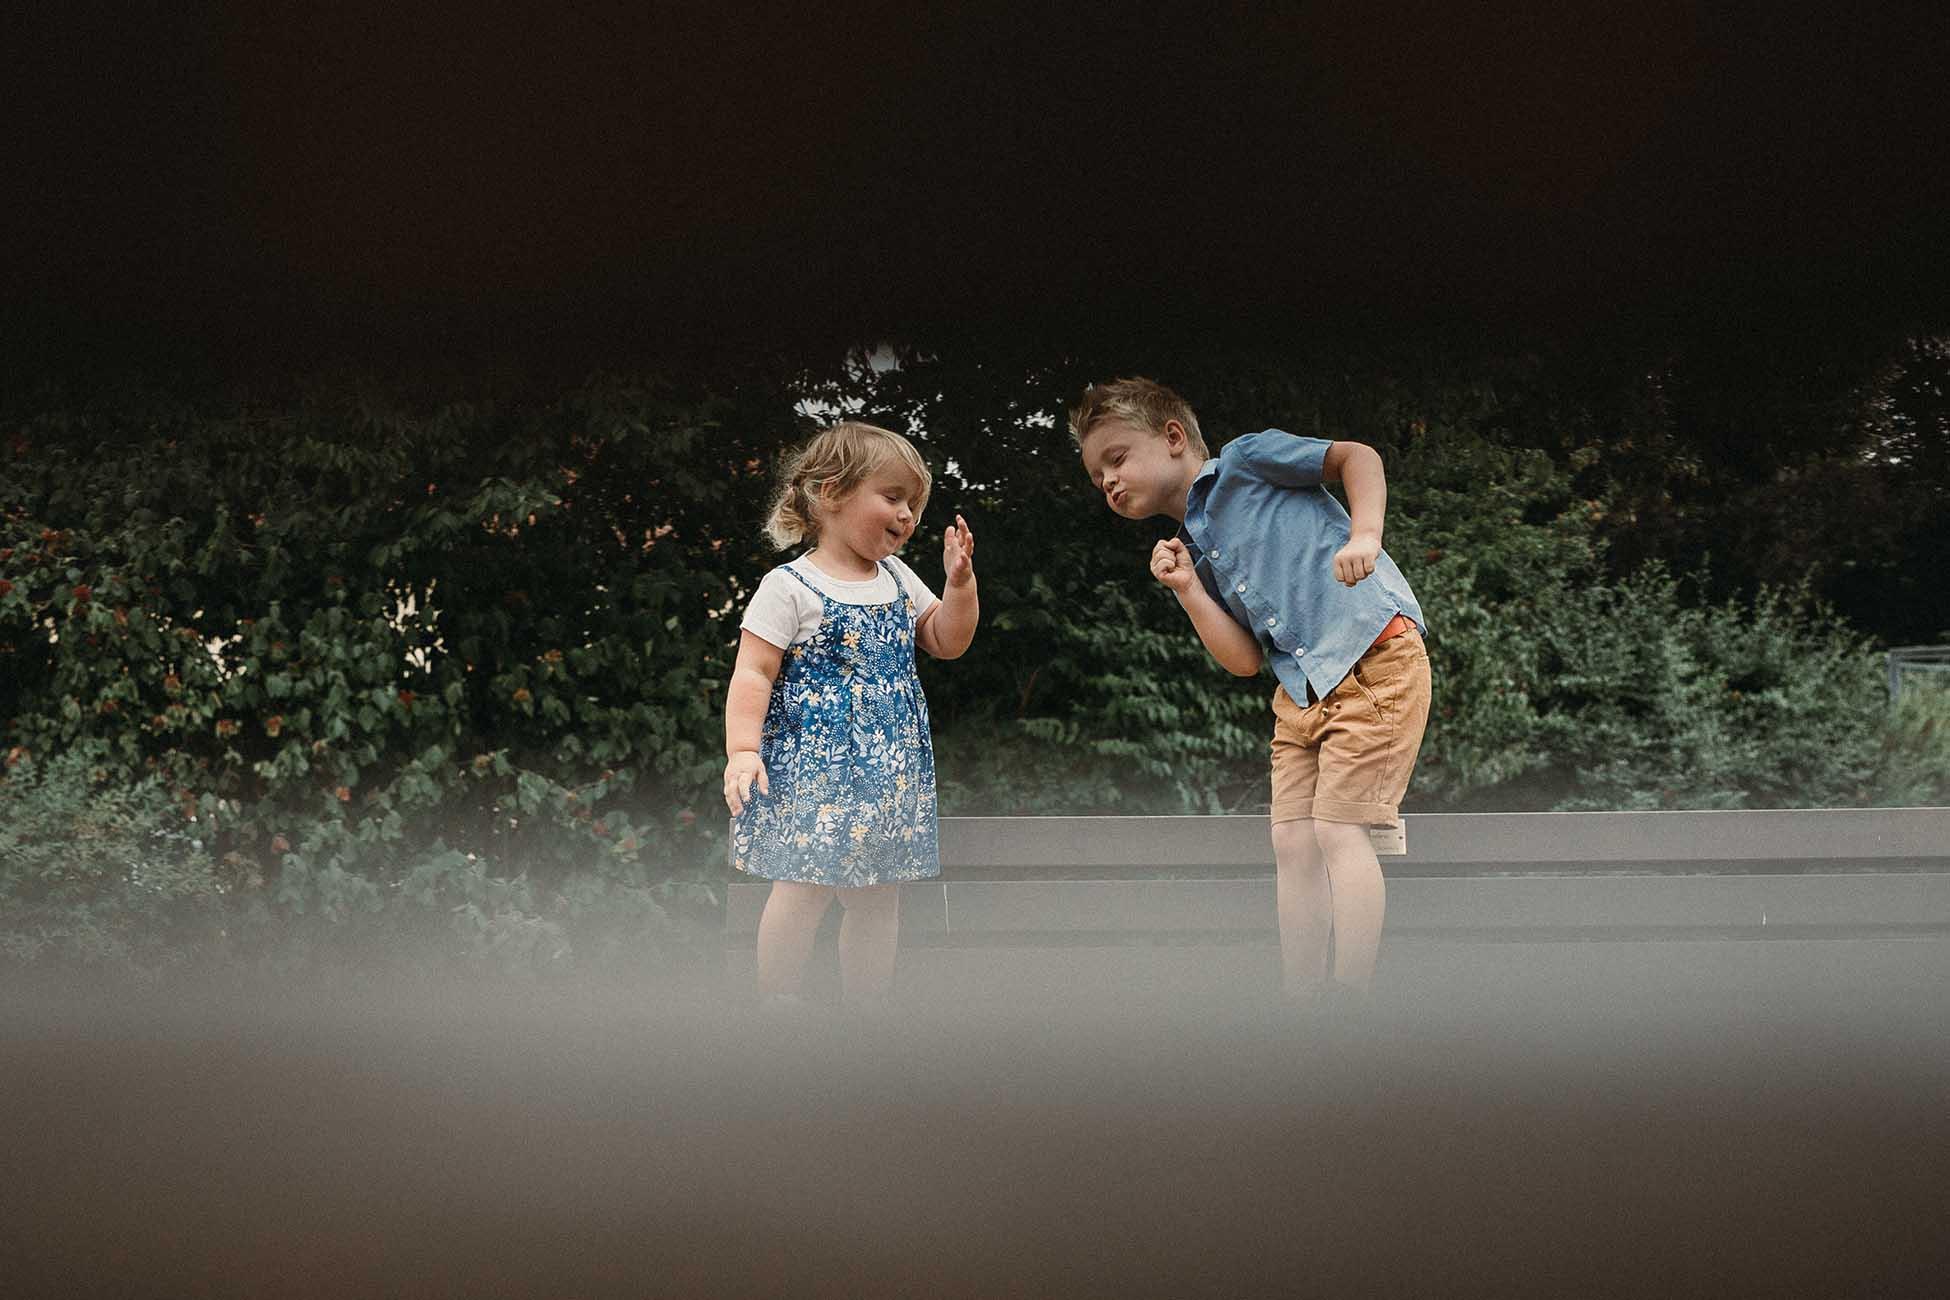 Familienshooting-8357